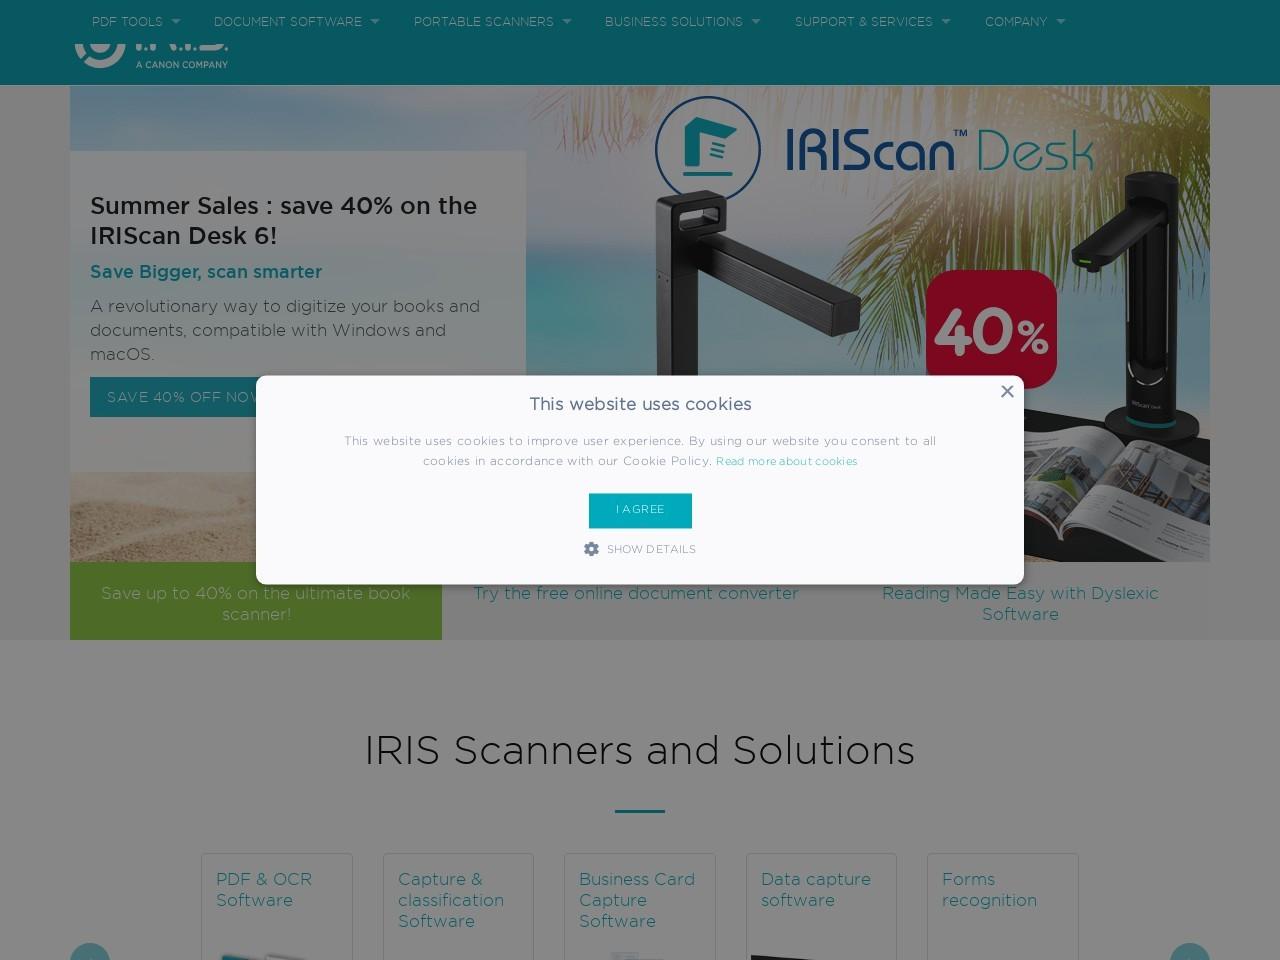 IRIS Link